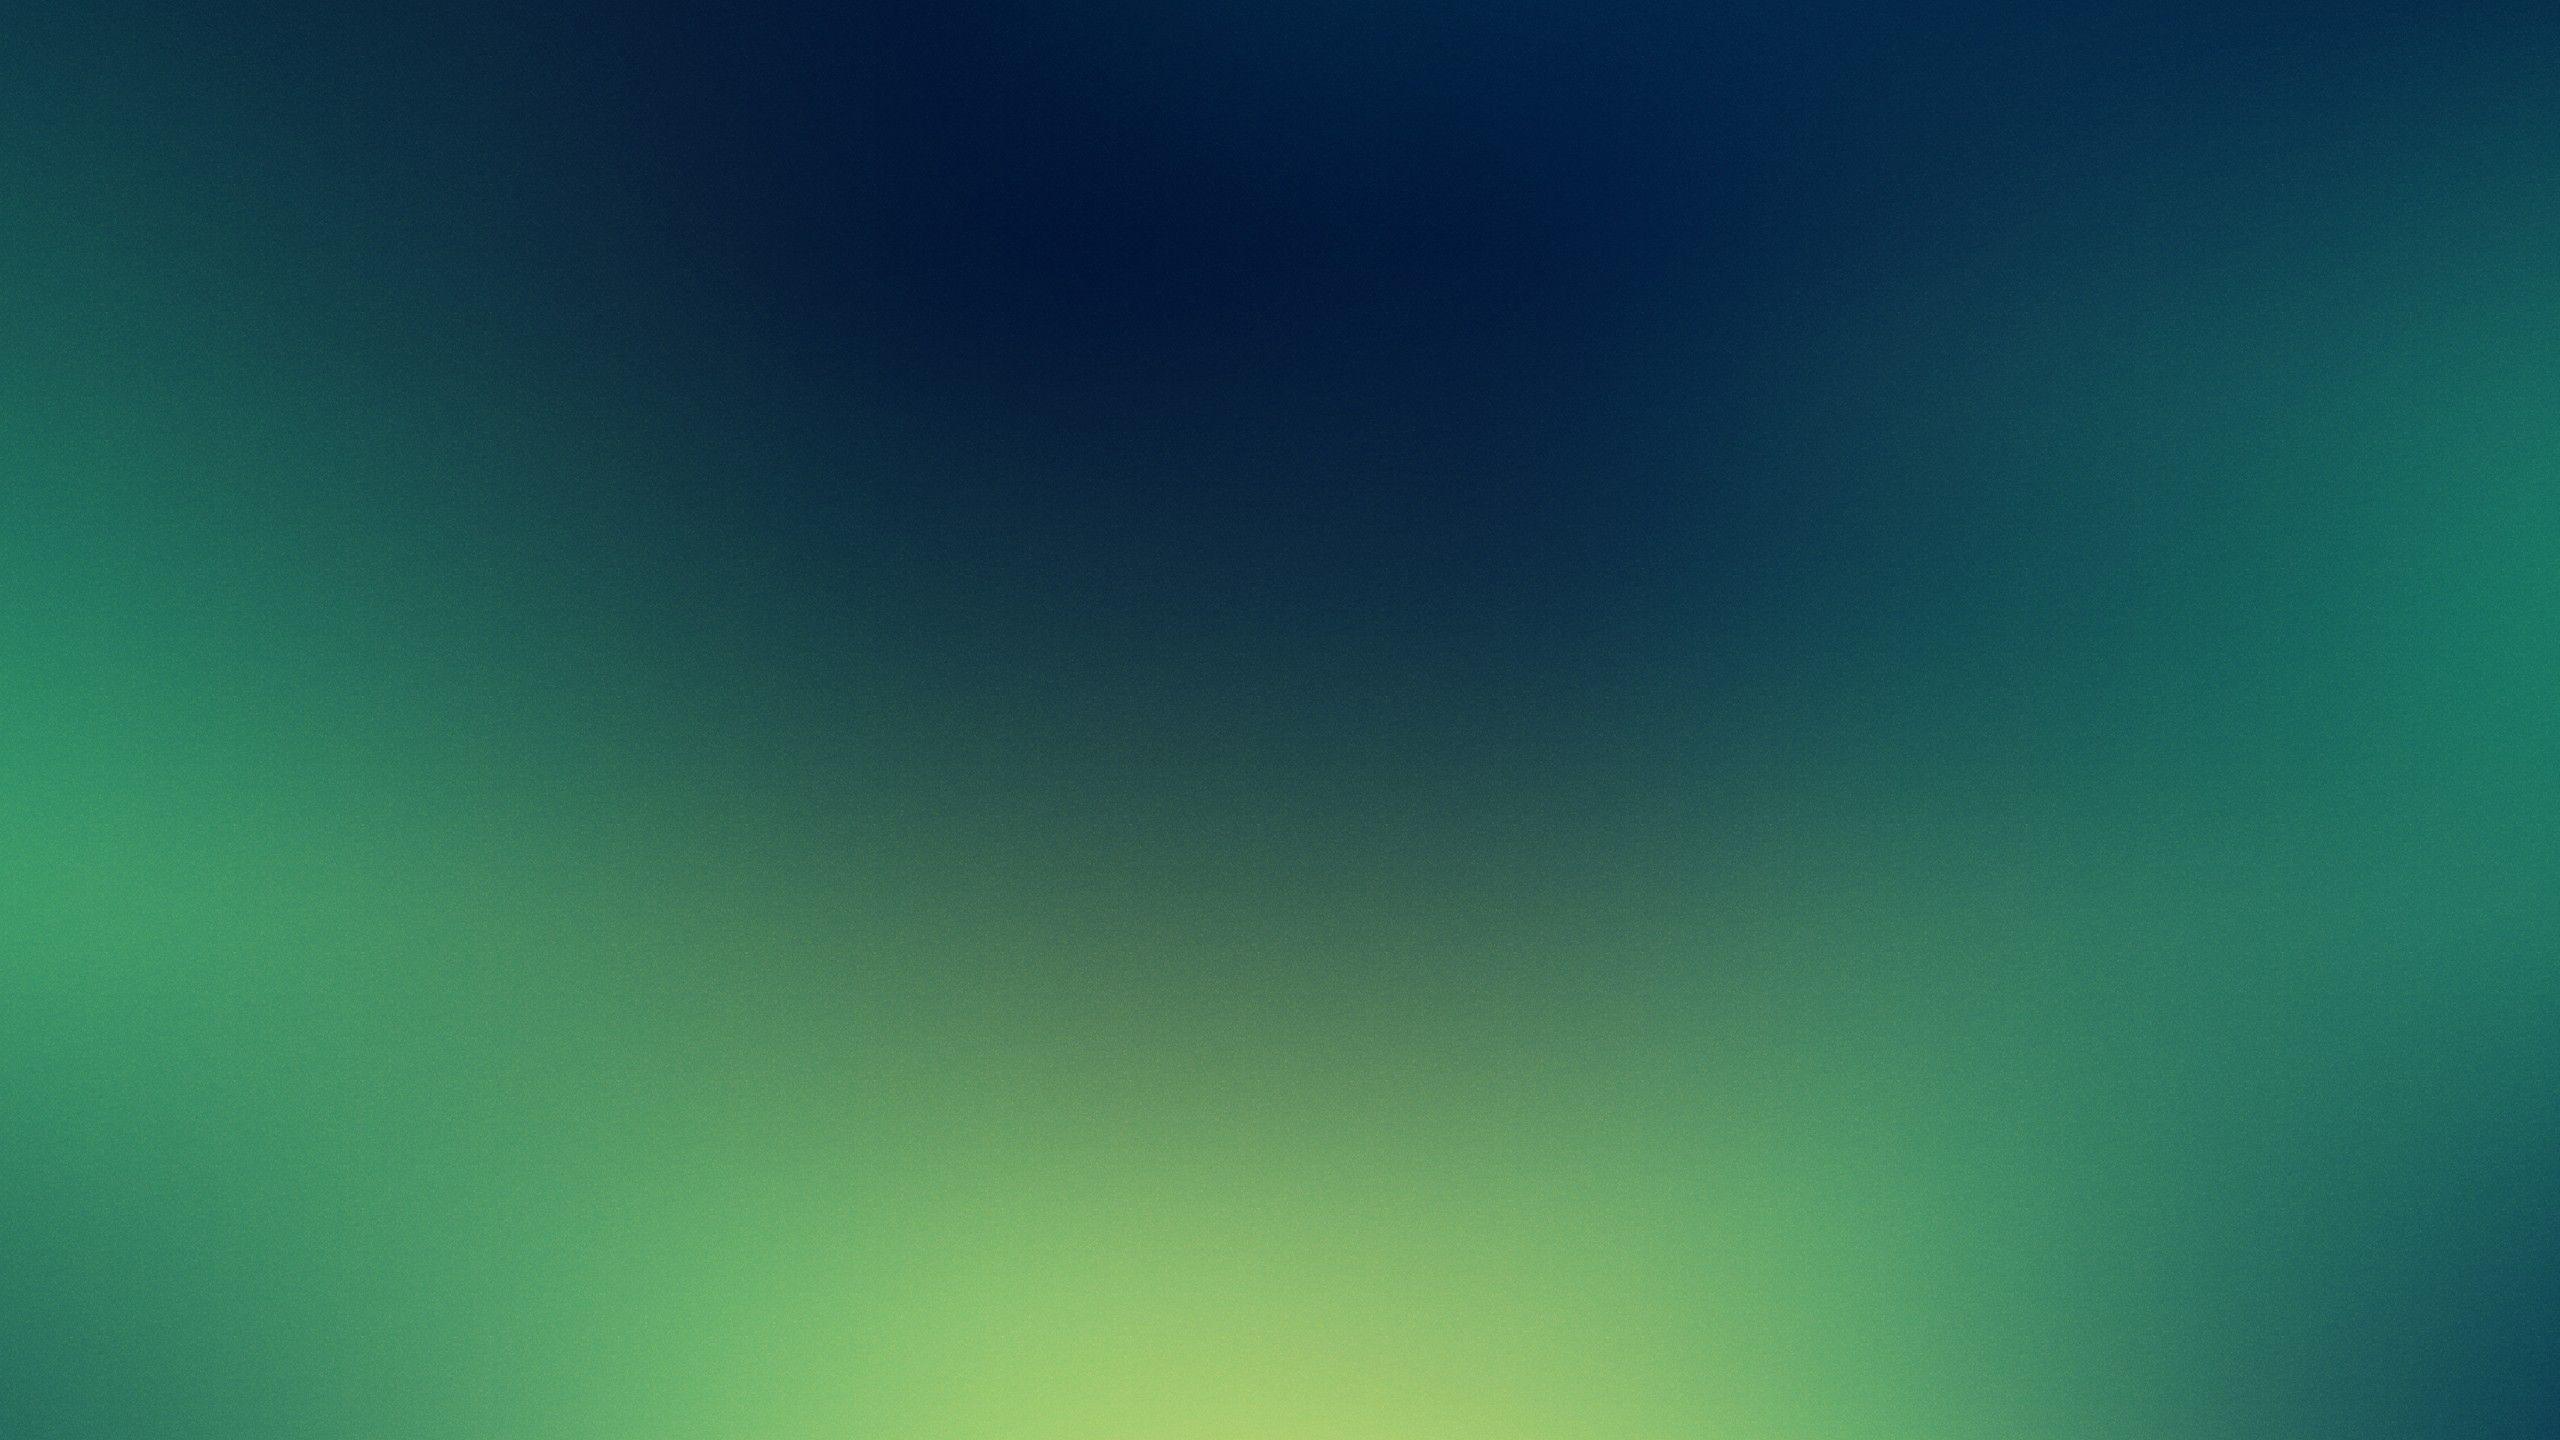 minimalistic multicolor backgrounds blurred - photo #19